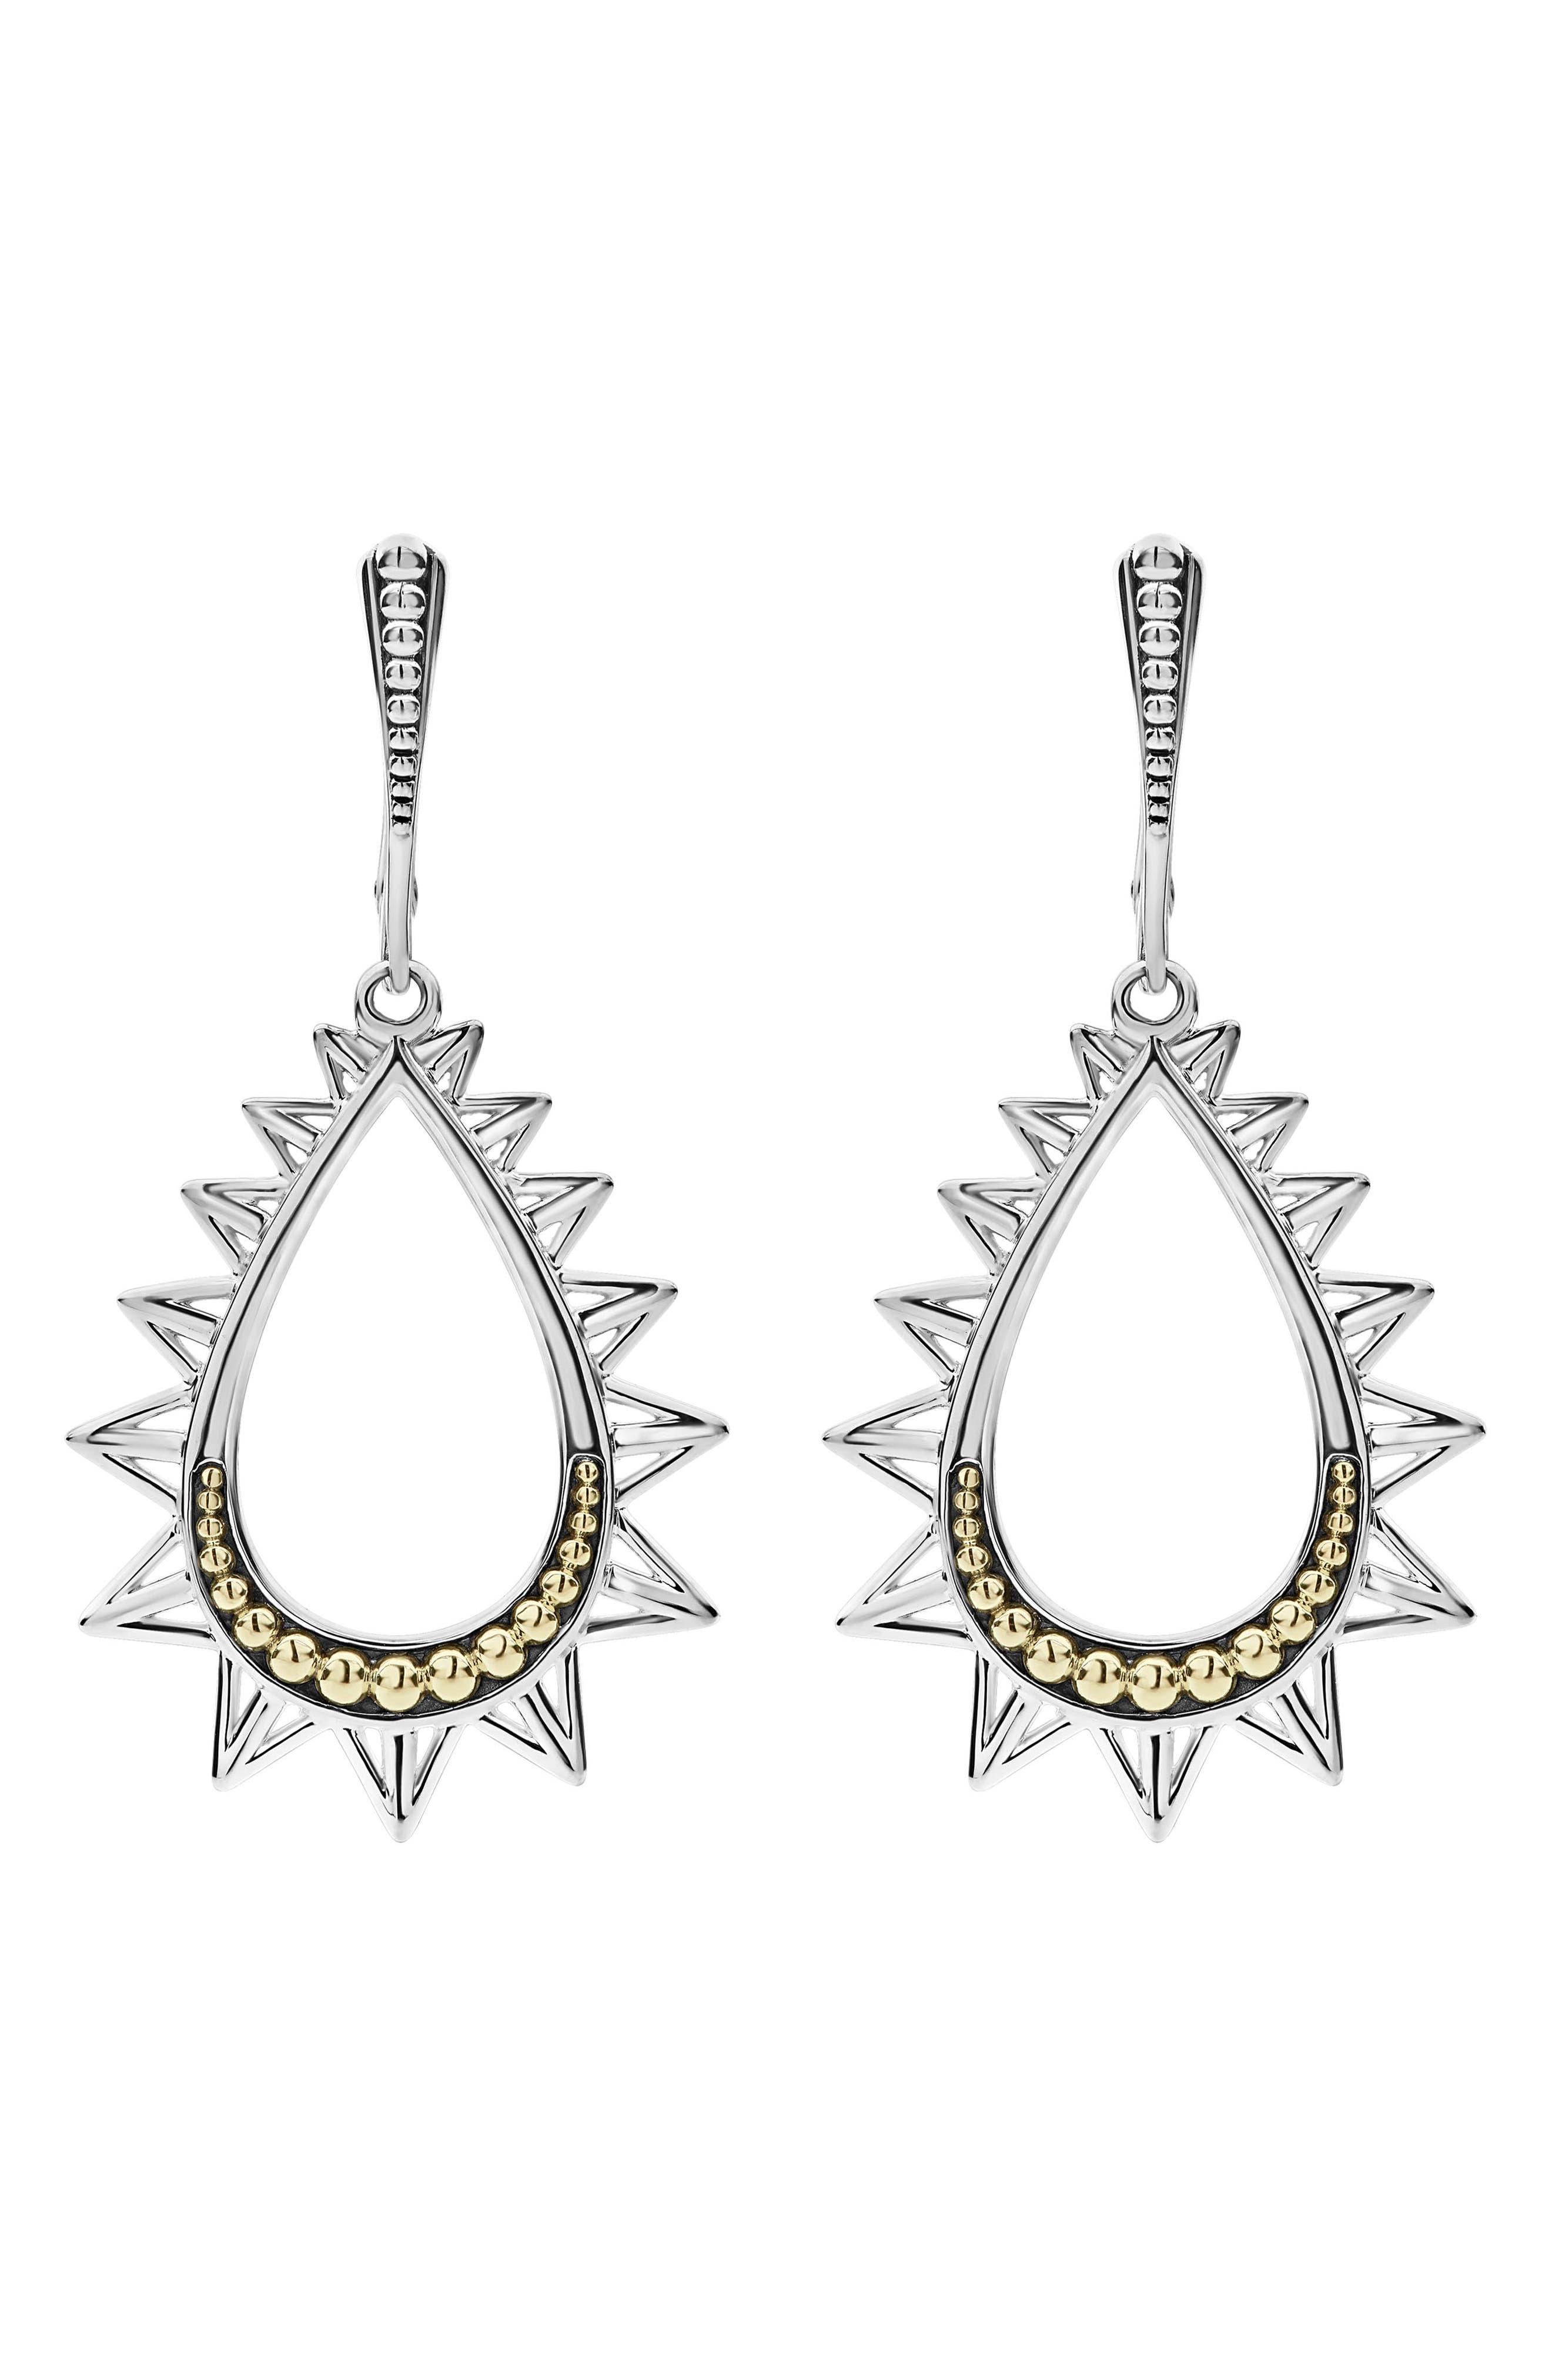 KSL Spiked Pear Drop Earrings,                             Alternate thumbnail 3, color,                             040